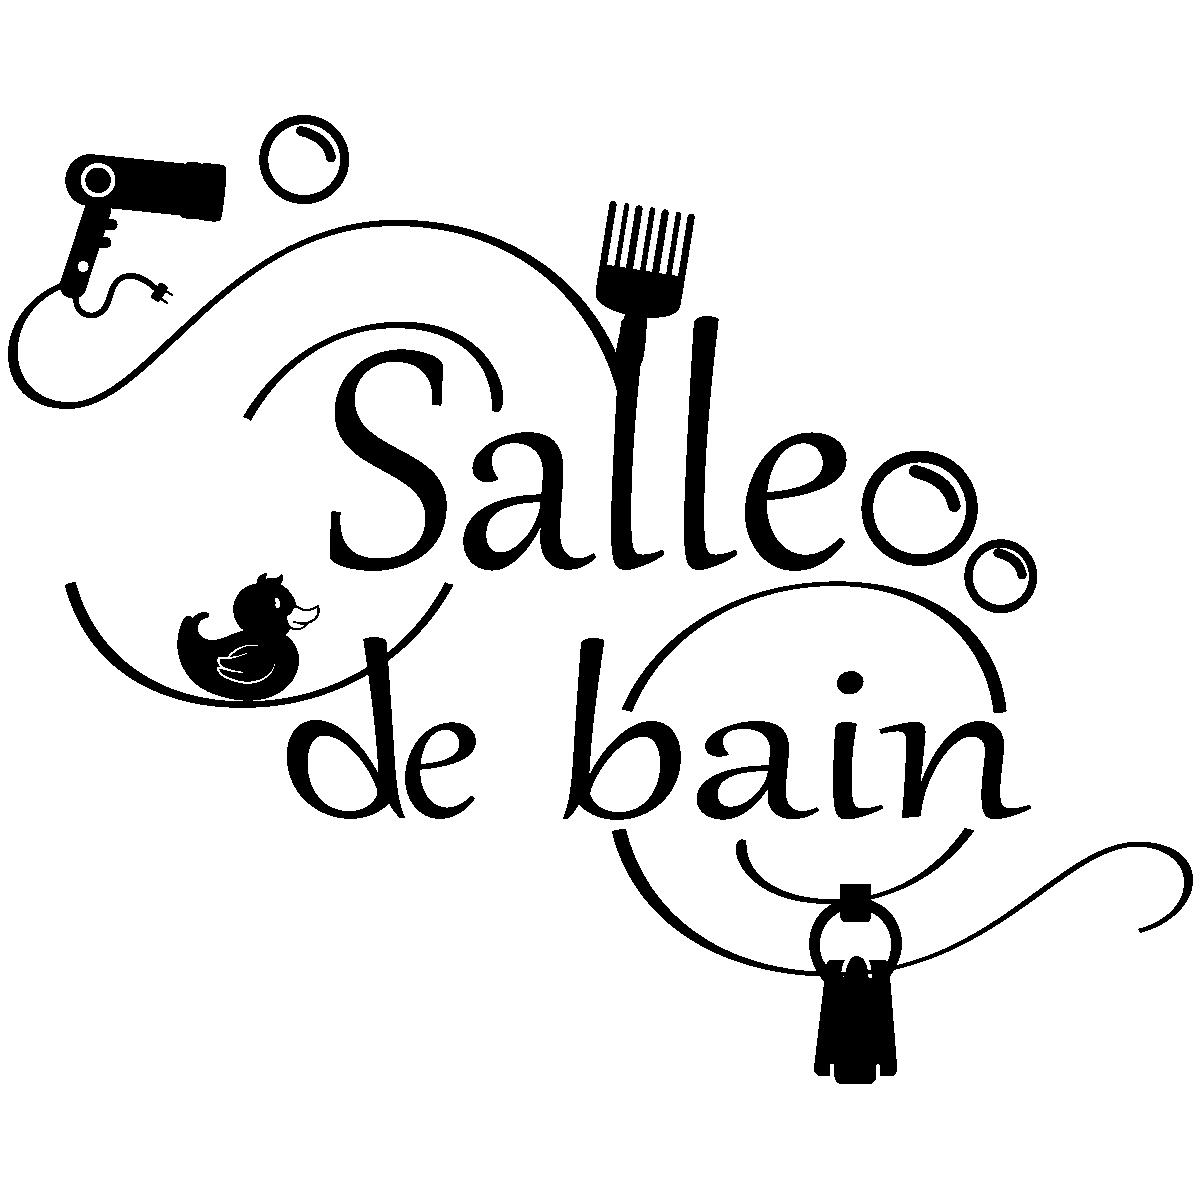 Sticker Salle De Bain Accessoires Stickers Salle De Bain Mur - Stickers salle de bain